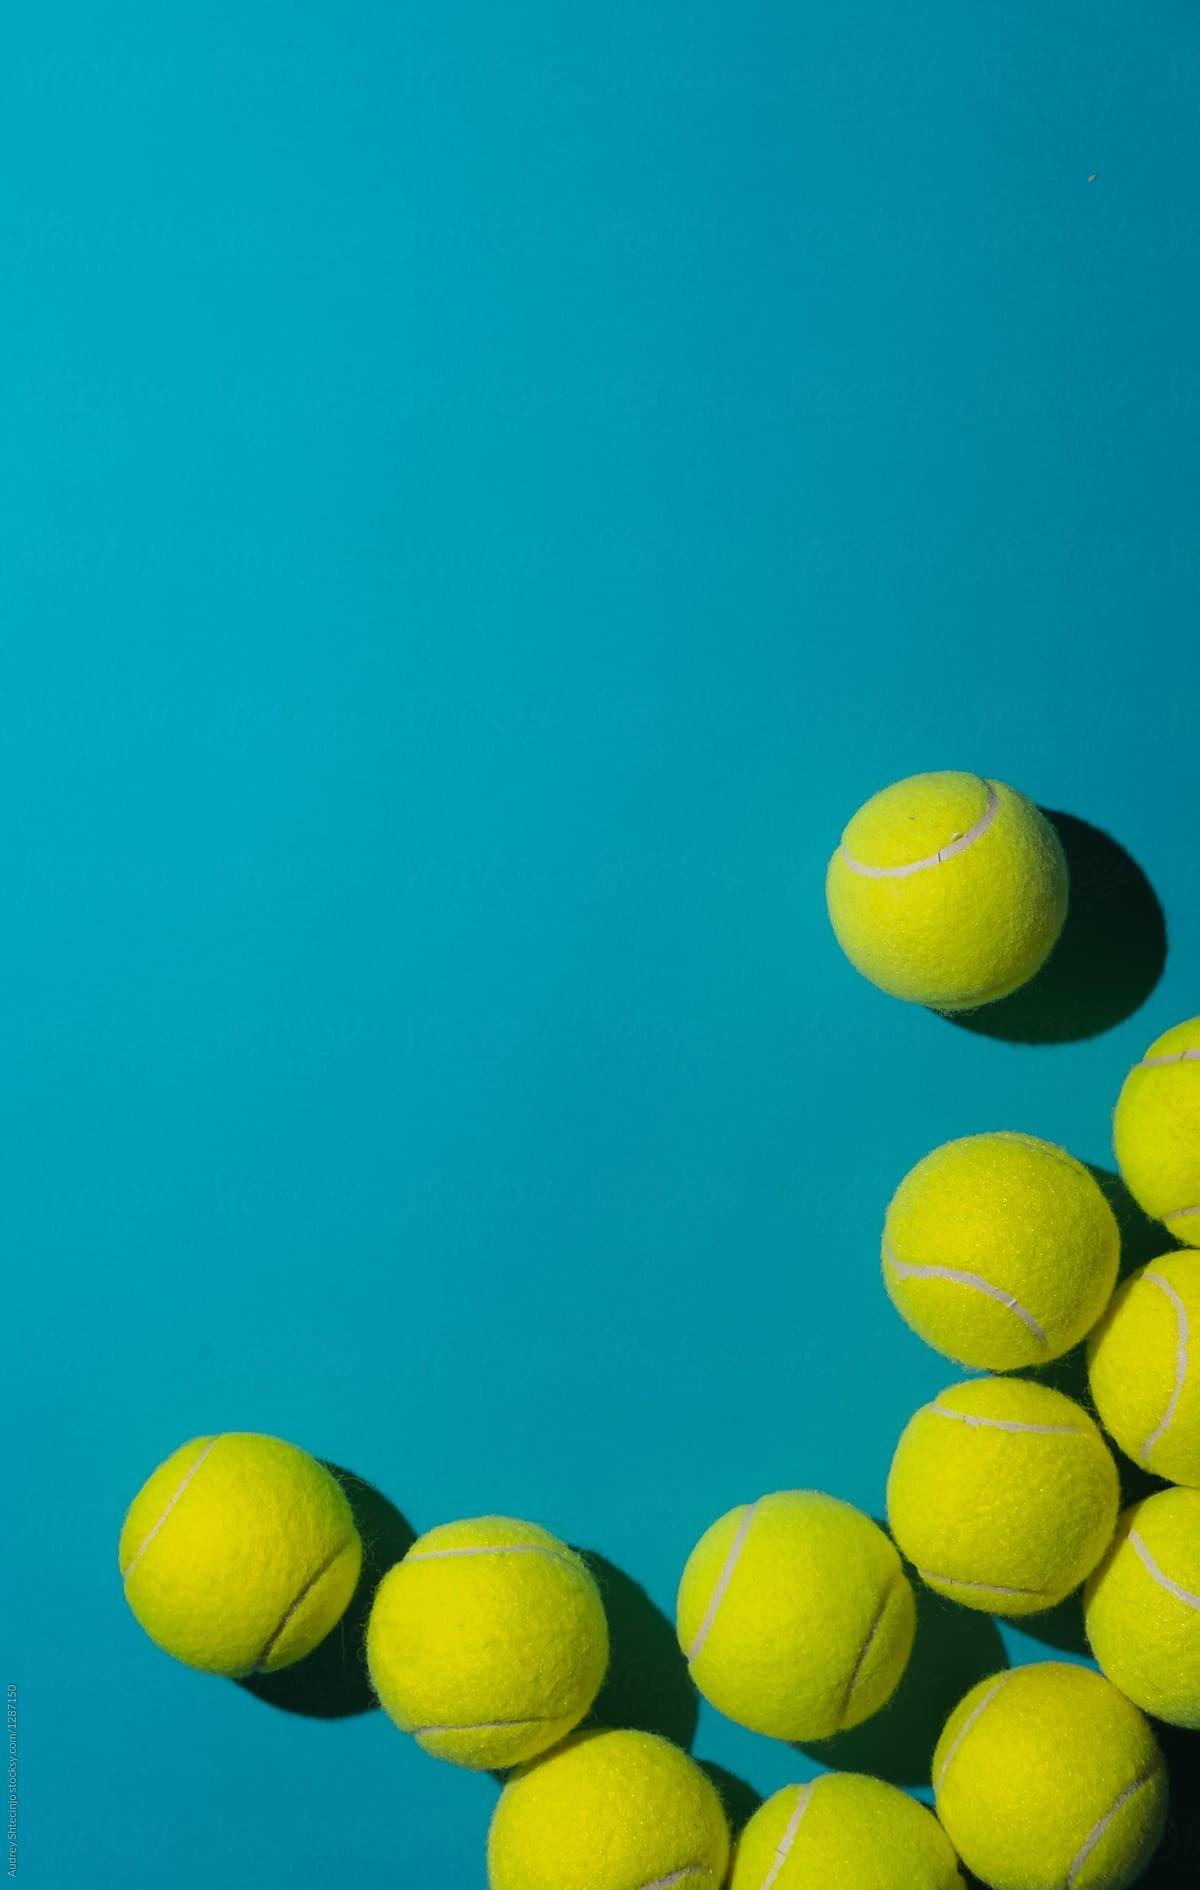 Love Tennis Art Tennis Photography Tennis Wallpaper Tennis Lessons